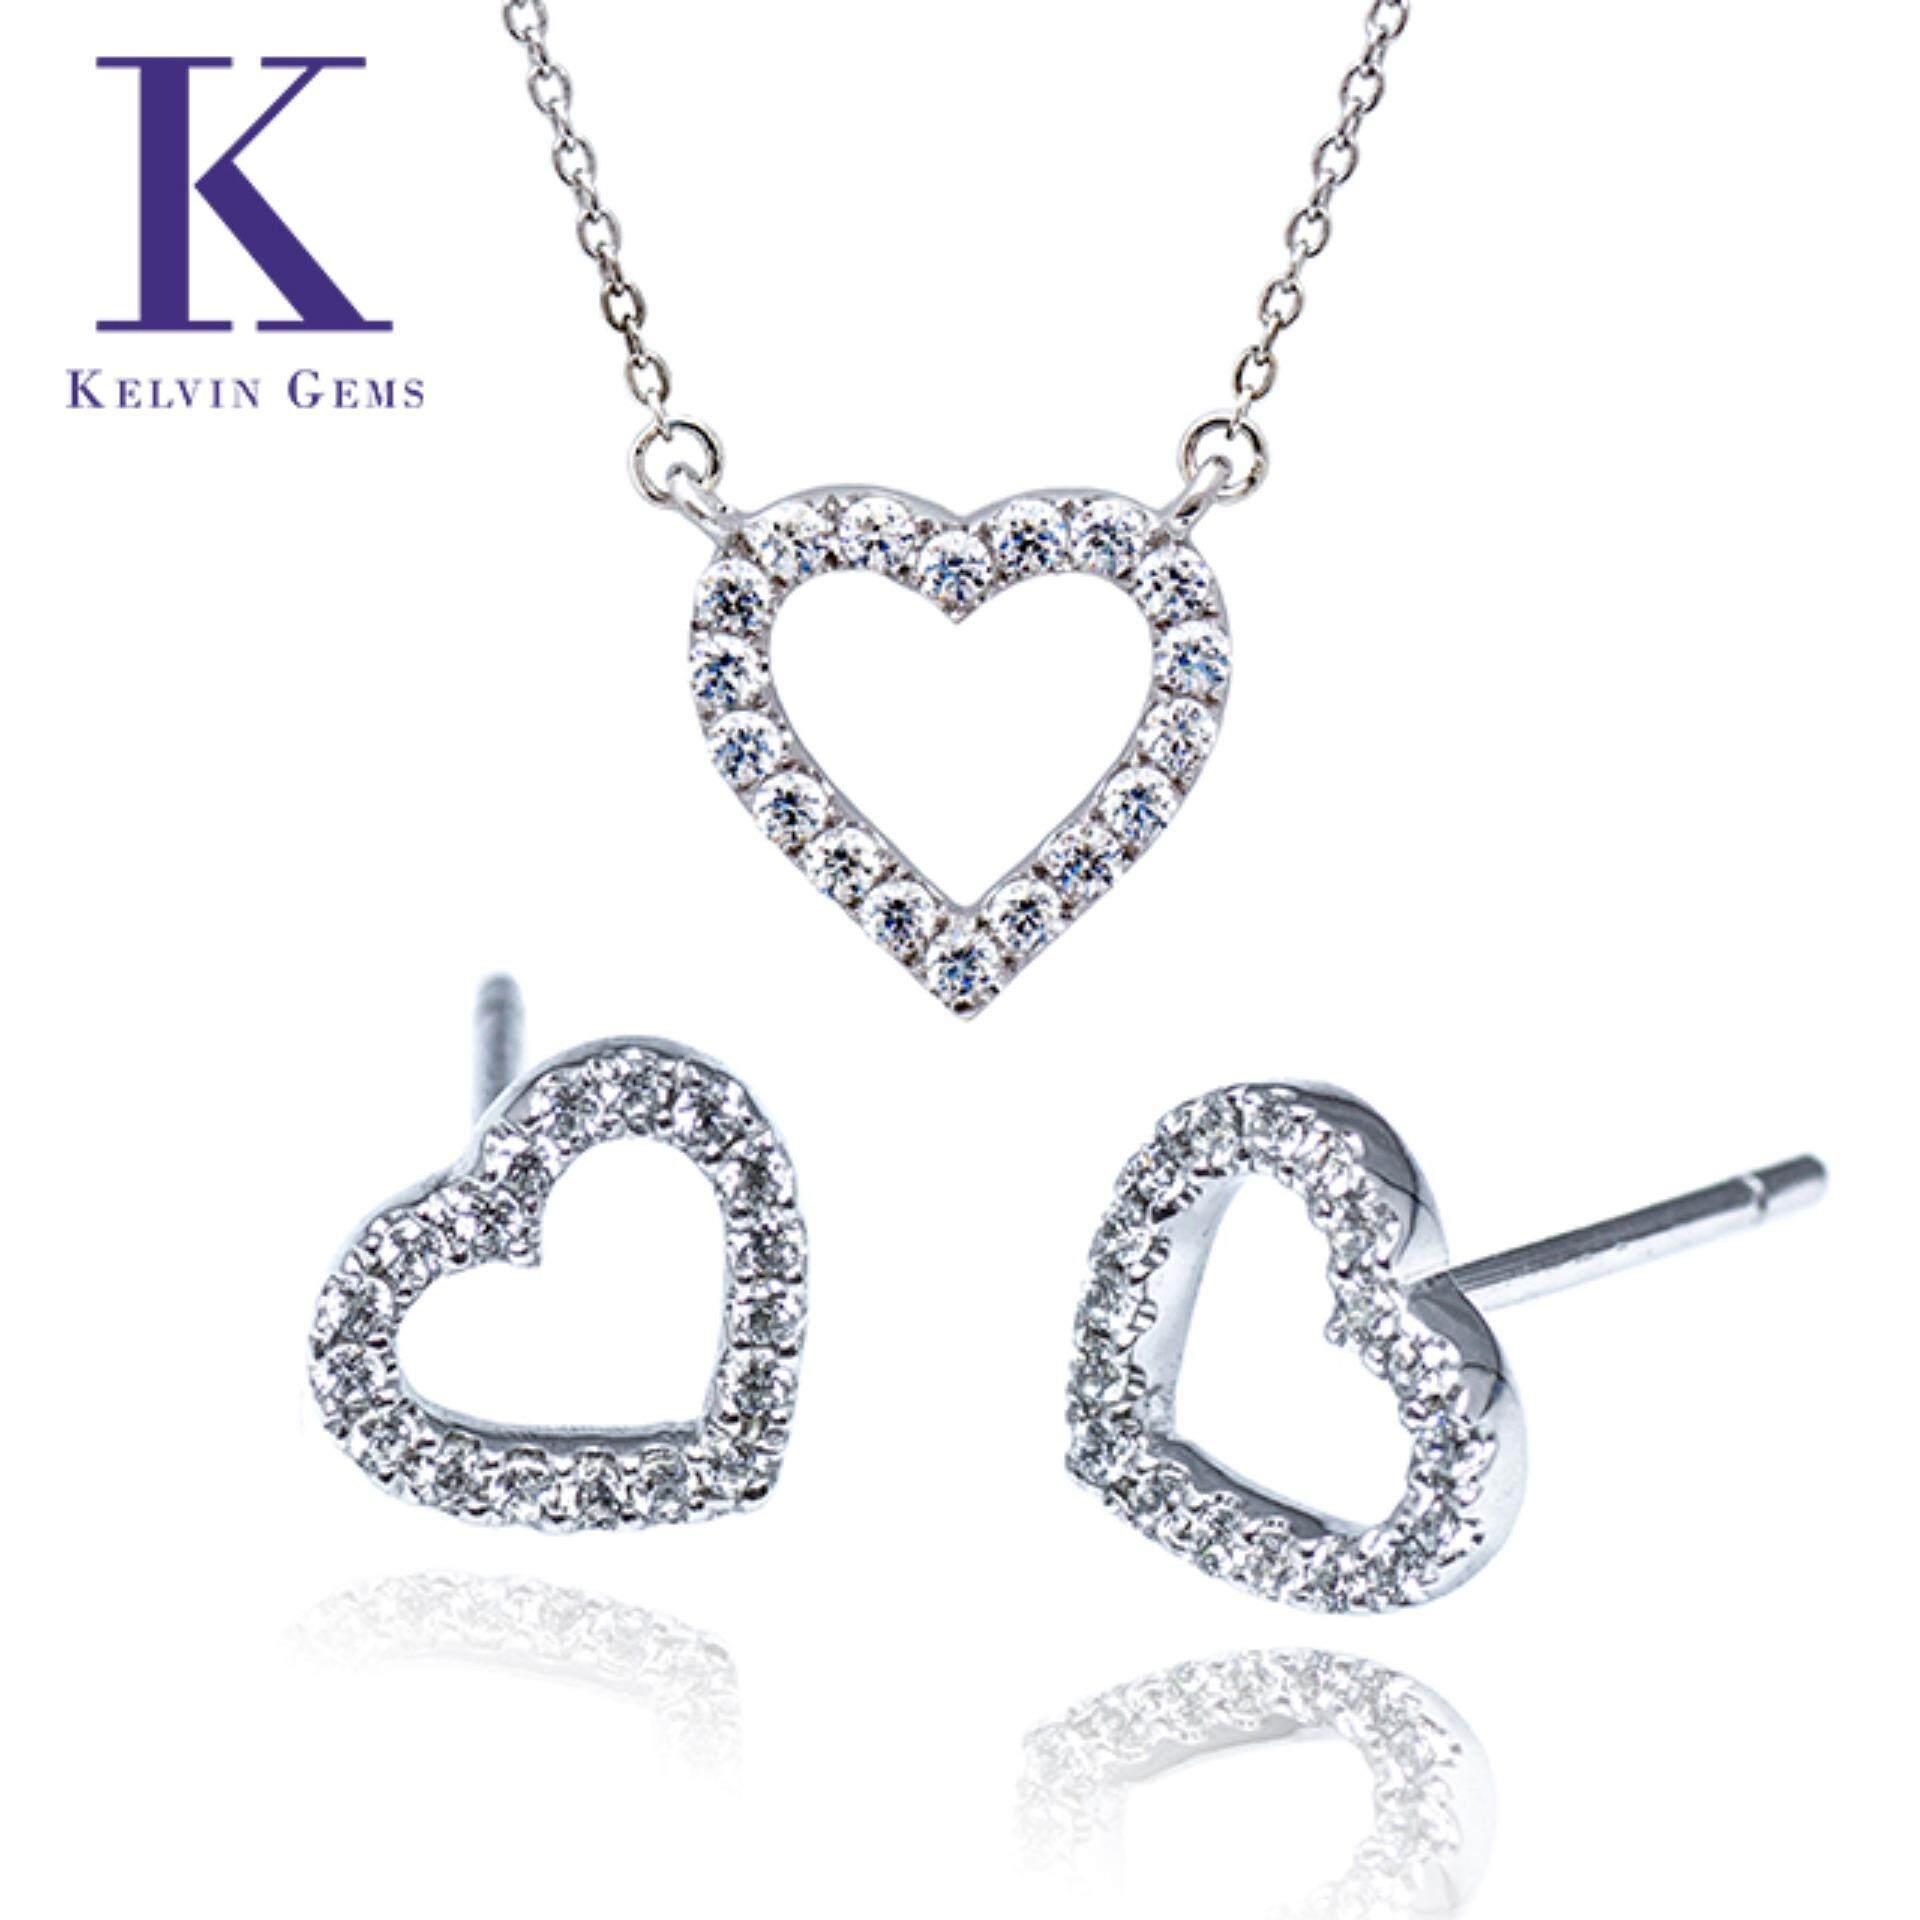 Kelvin Gems Premium My Heart Pendant & Earrings Gift Set m/w SWAROVSKI Zirconia